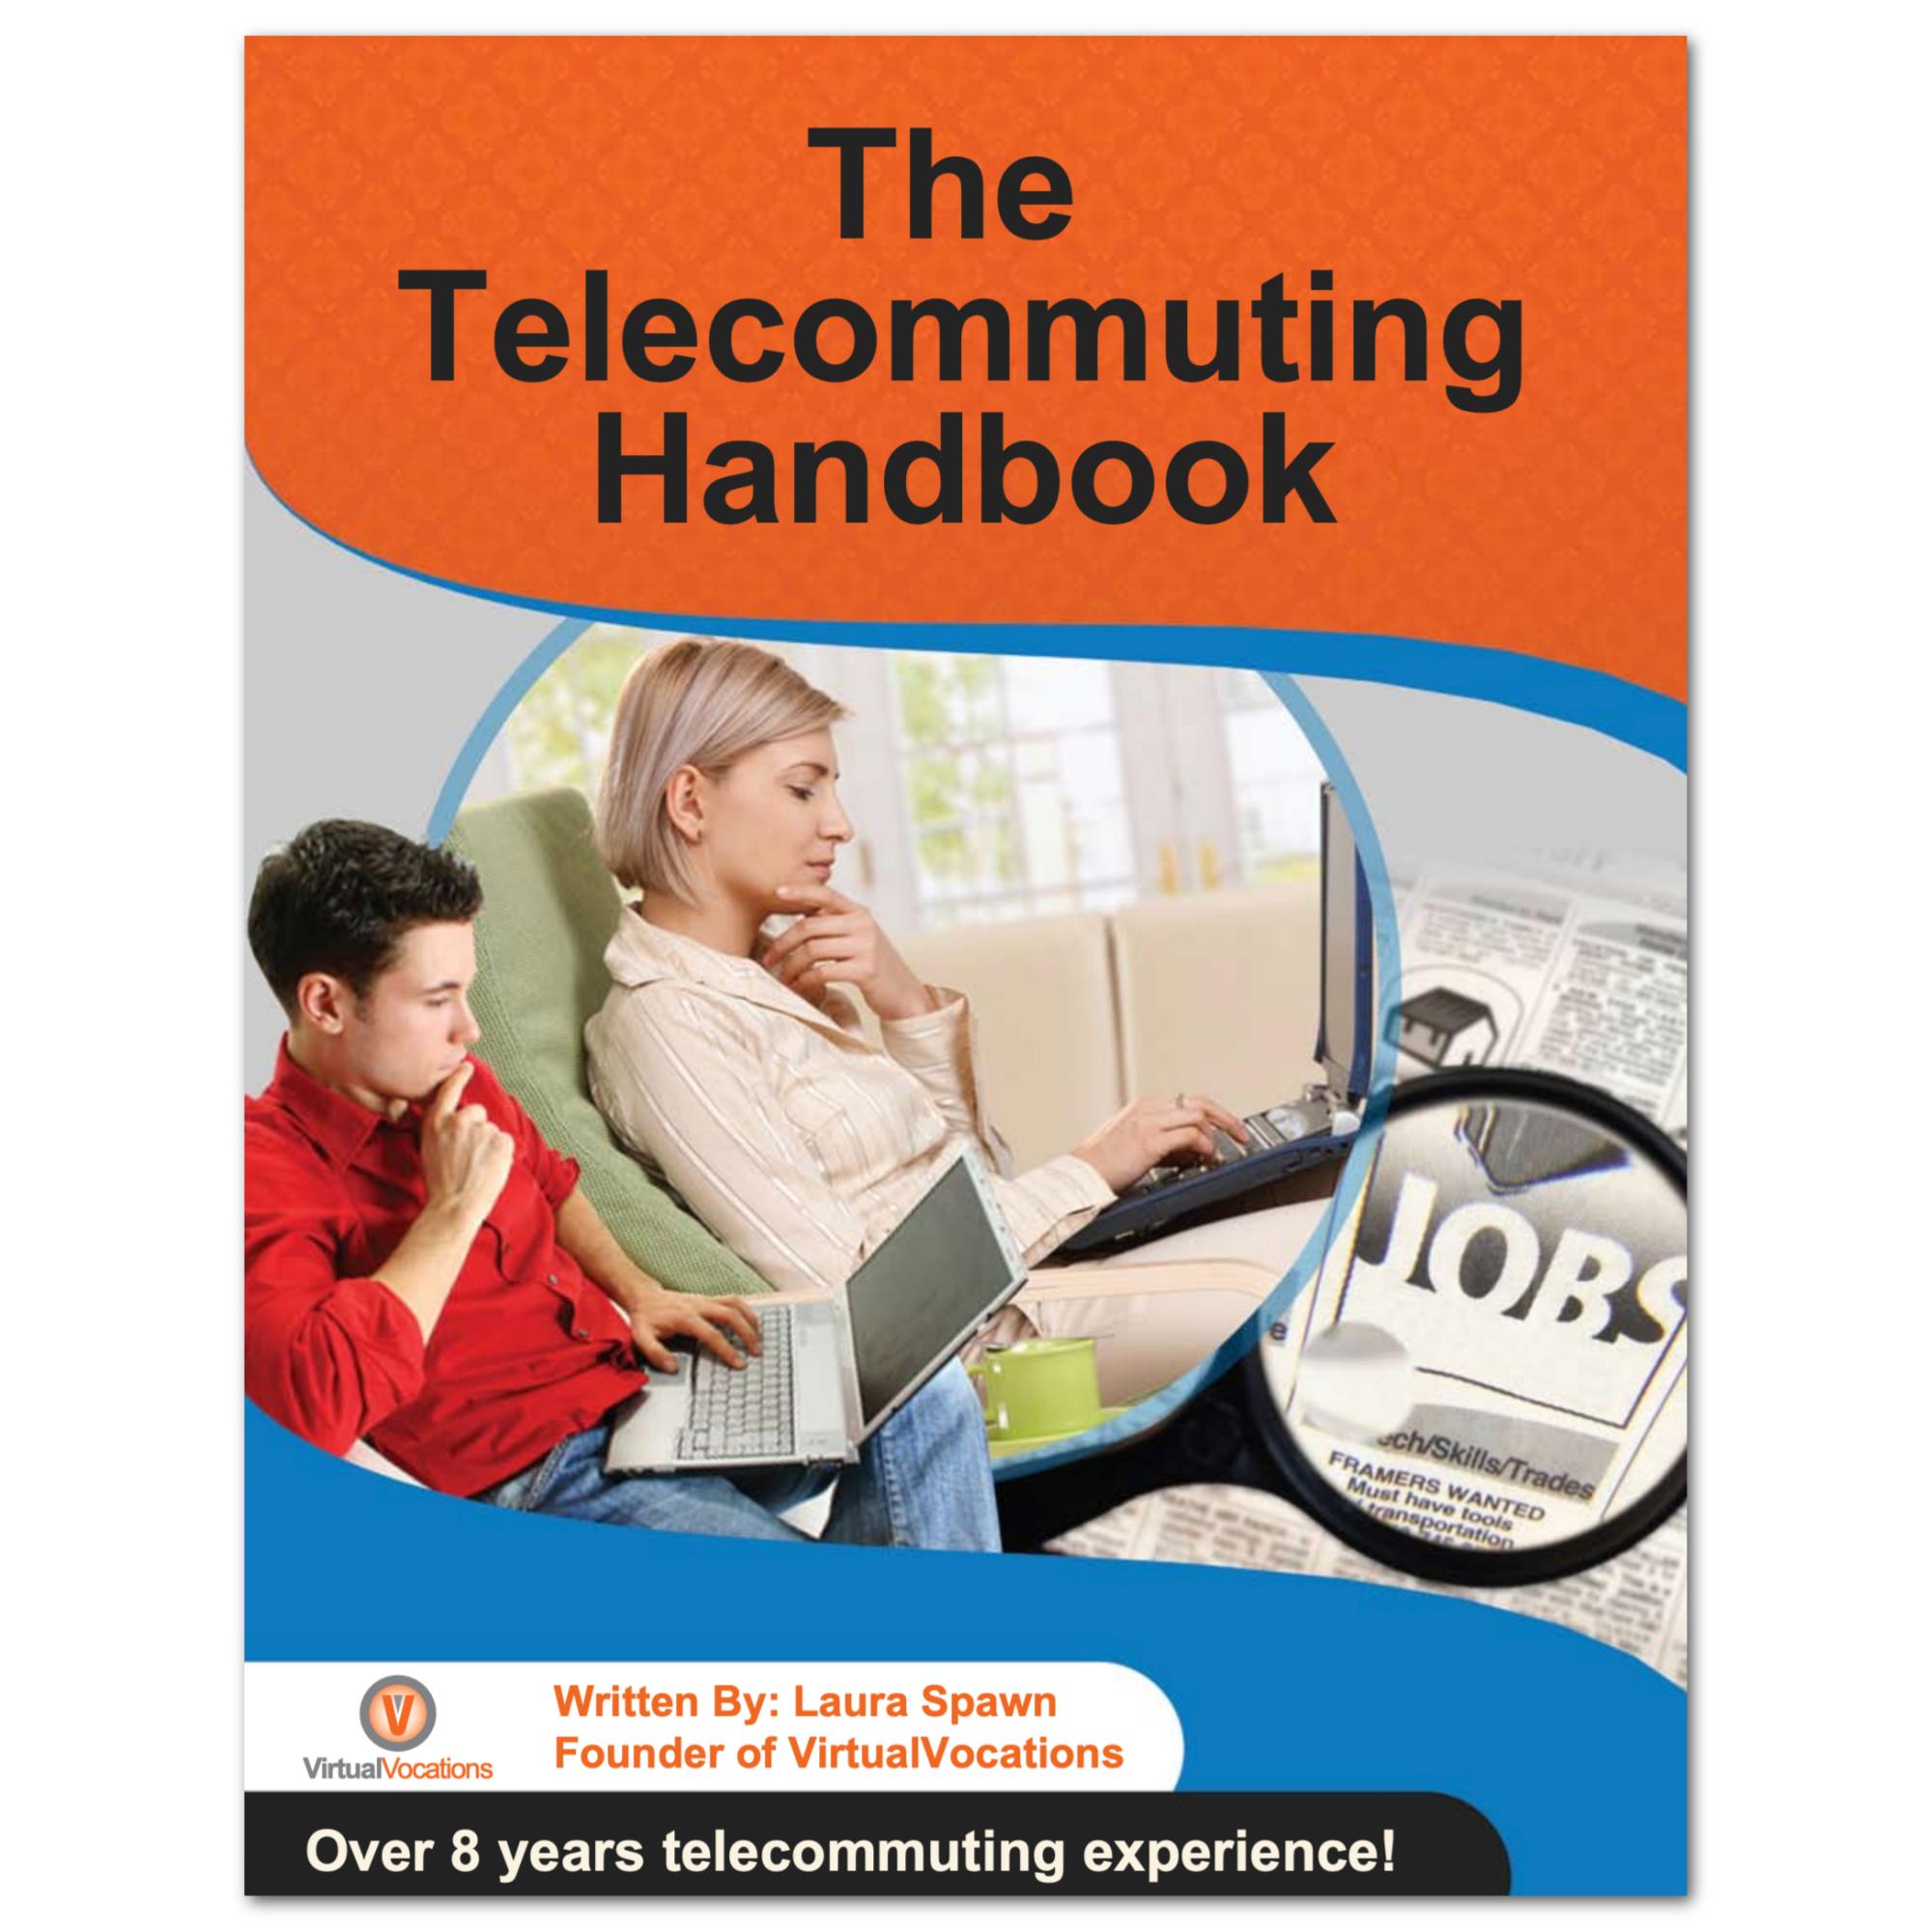 The Telecommuting Handbook